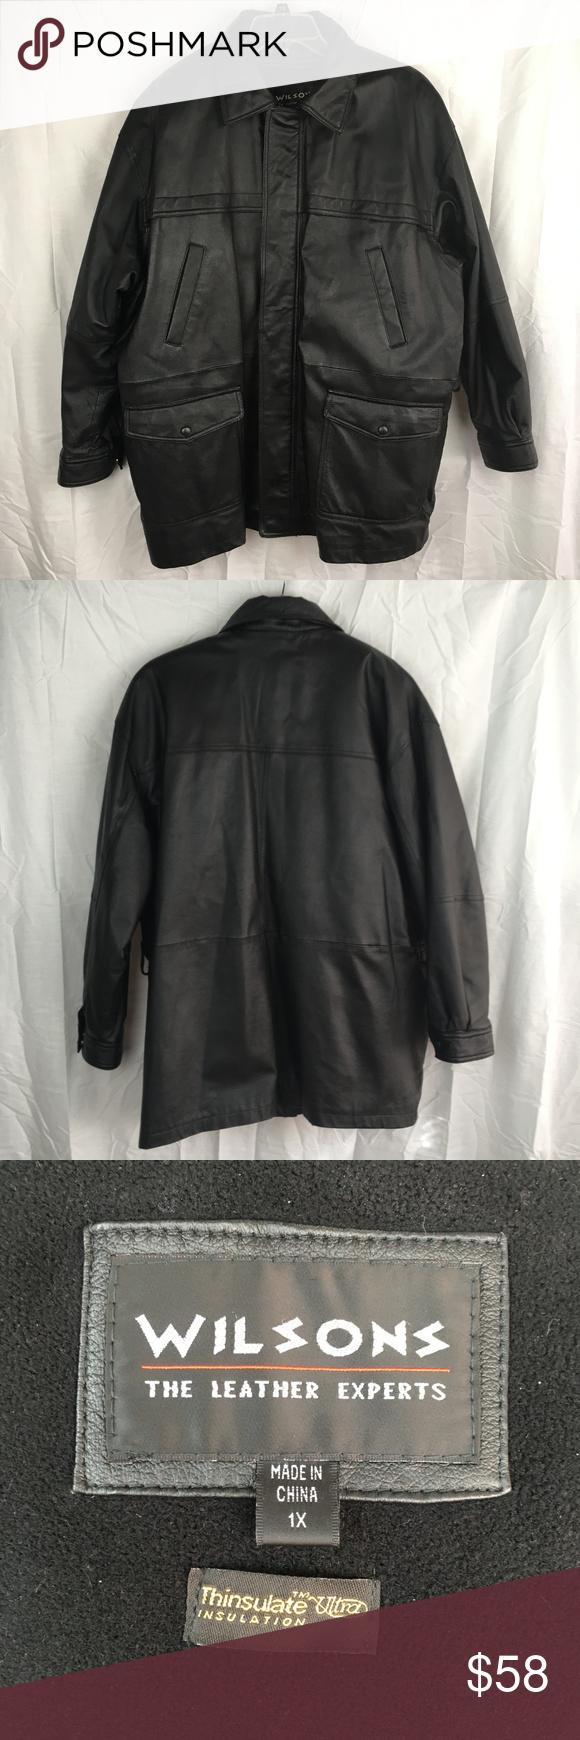 Wilsons Leather Jacket Big Mens Size 1x Lined Coat Wilson S Leather Big 1x Mens Leather Jacket Great C Leather Jacket Wilsons Leather Wilsons Leather Jacket [ 1740 x 580 Pixel ]